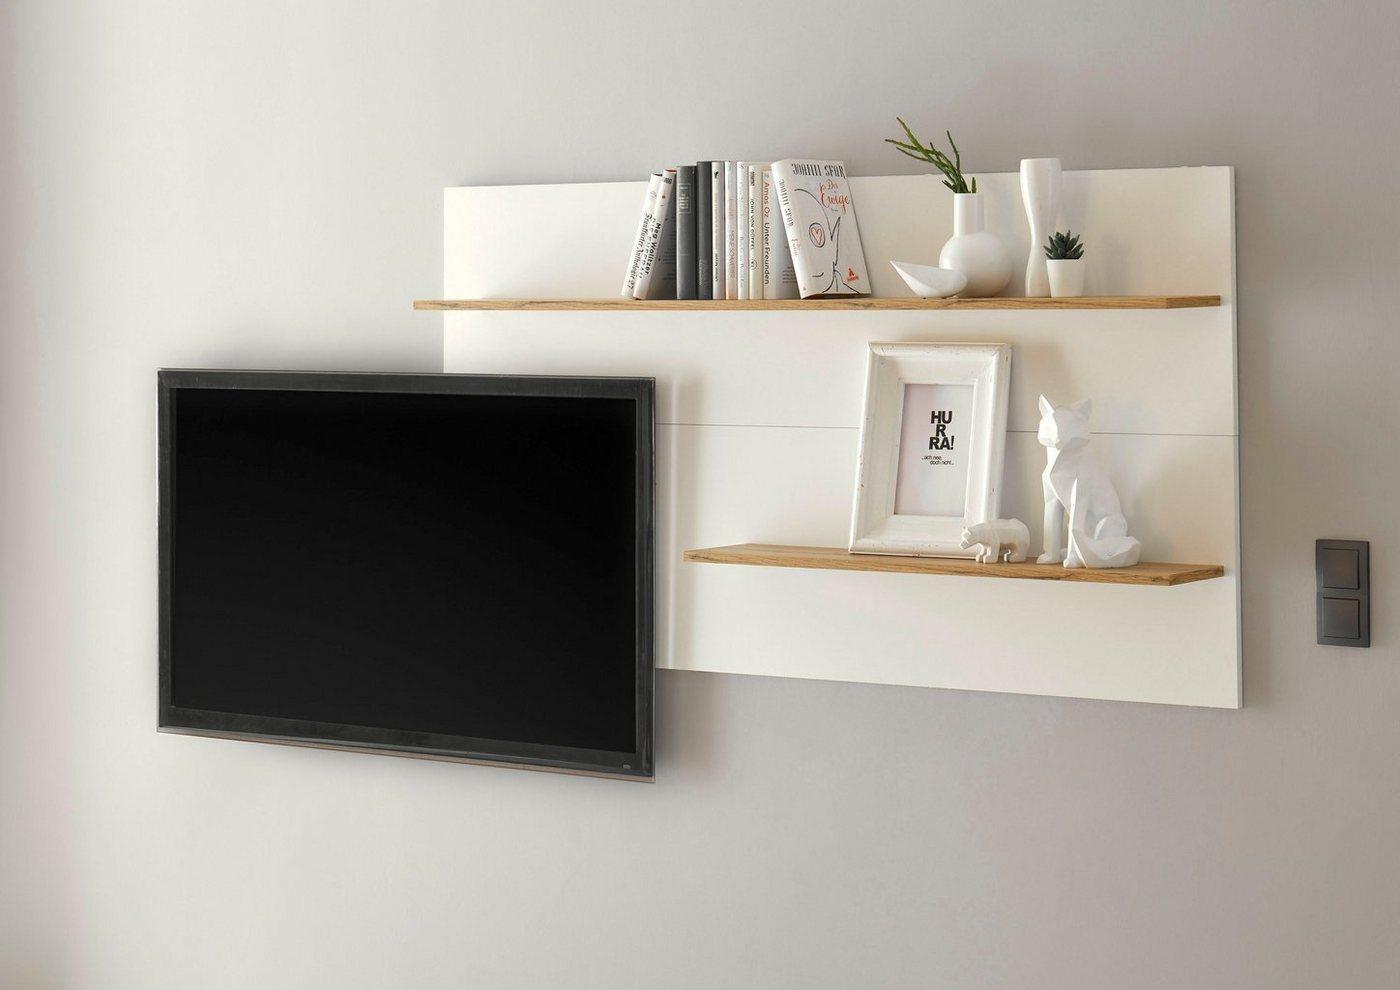 INOSIGN Wandpaneel »CiTY Wandpaneel 72«, im modernen Design, weiß